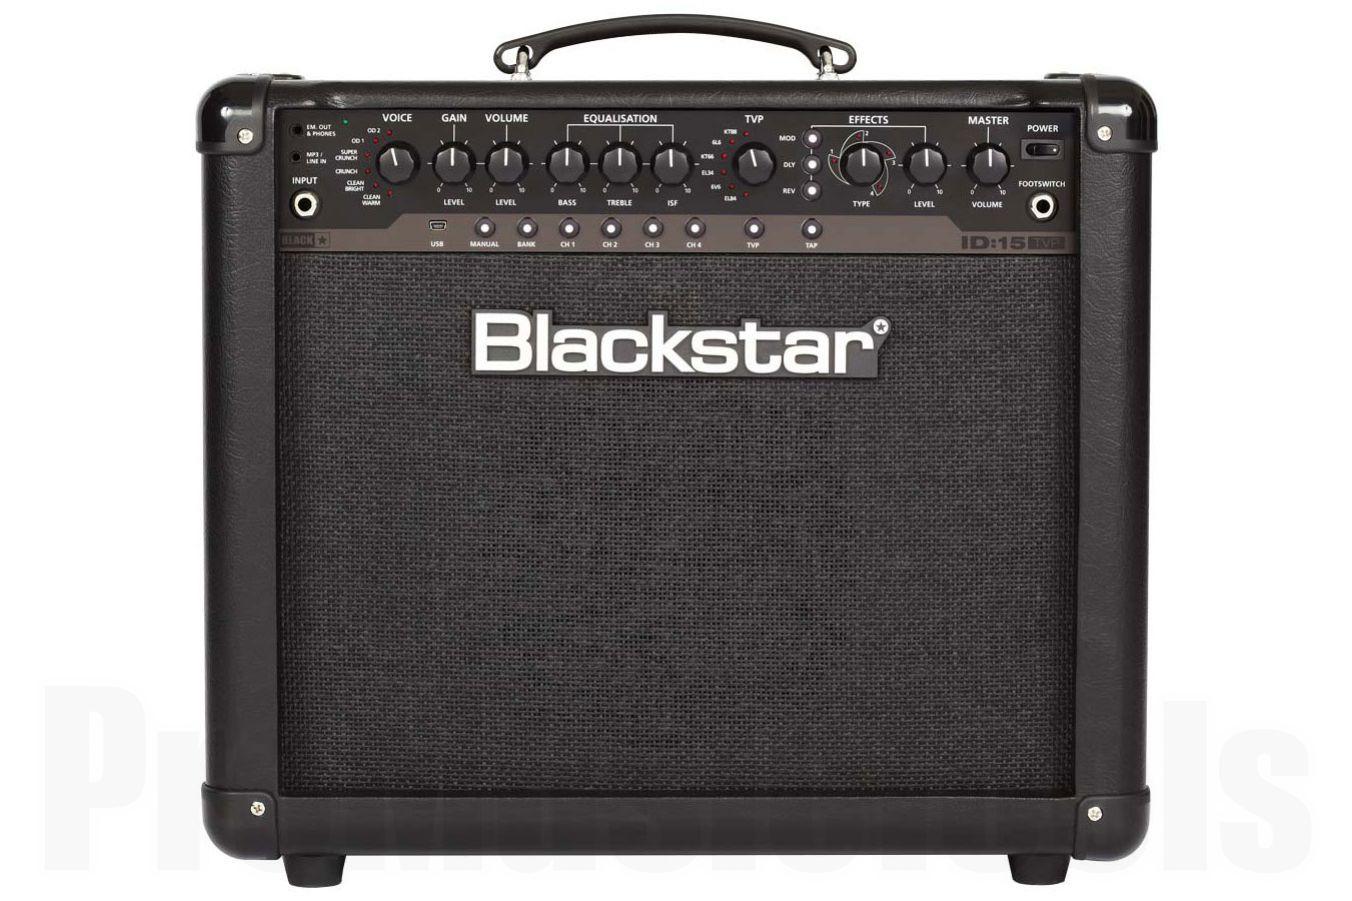 Blackstar ID:15 TVP Combo - b-stock (1x opened box)